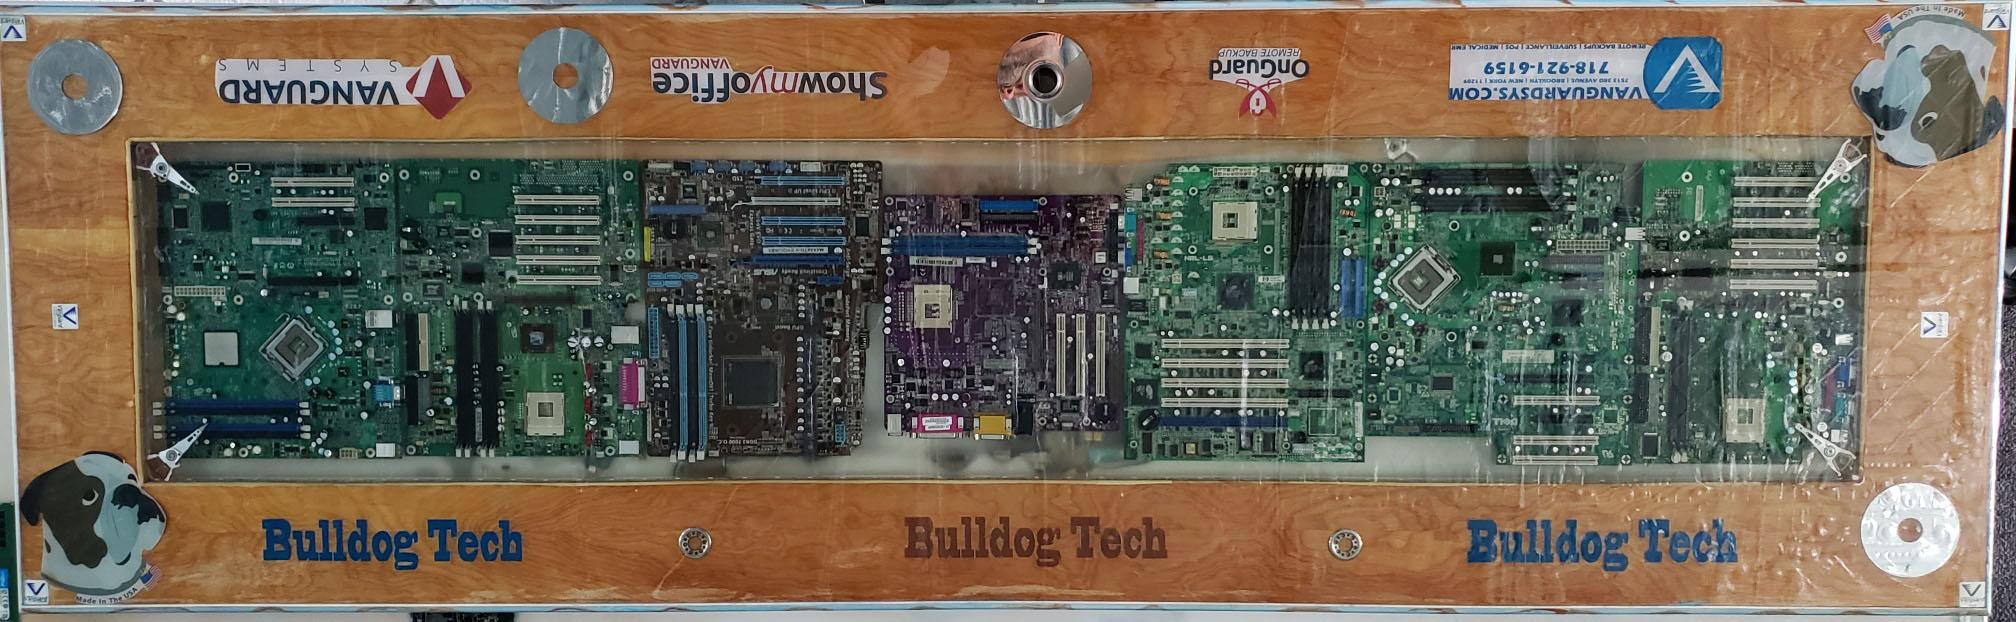 epoxy IT table